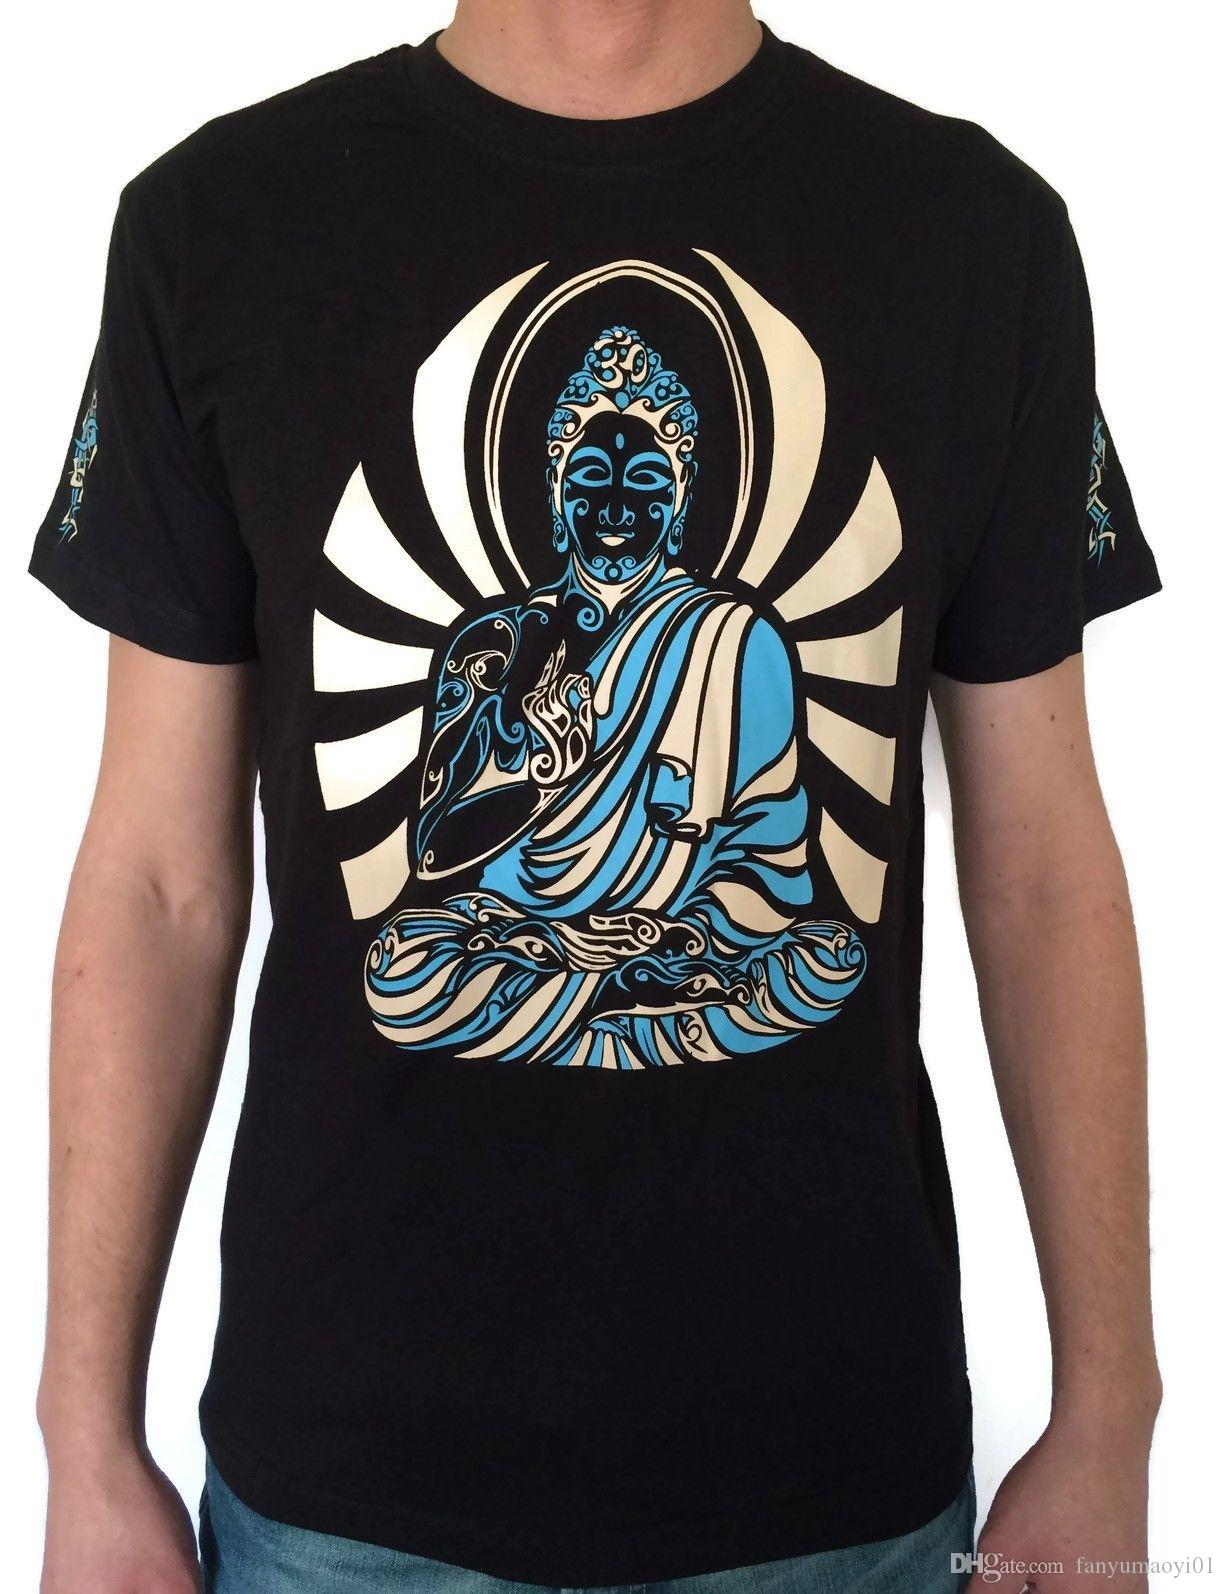 1b3ce8cfd96ba8 Print Round Neck Man Psy Buddha Mens Cotton T-shirt Psy Clothes Festival  Goa Psychedelic Art Goa Yoga